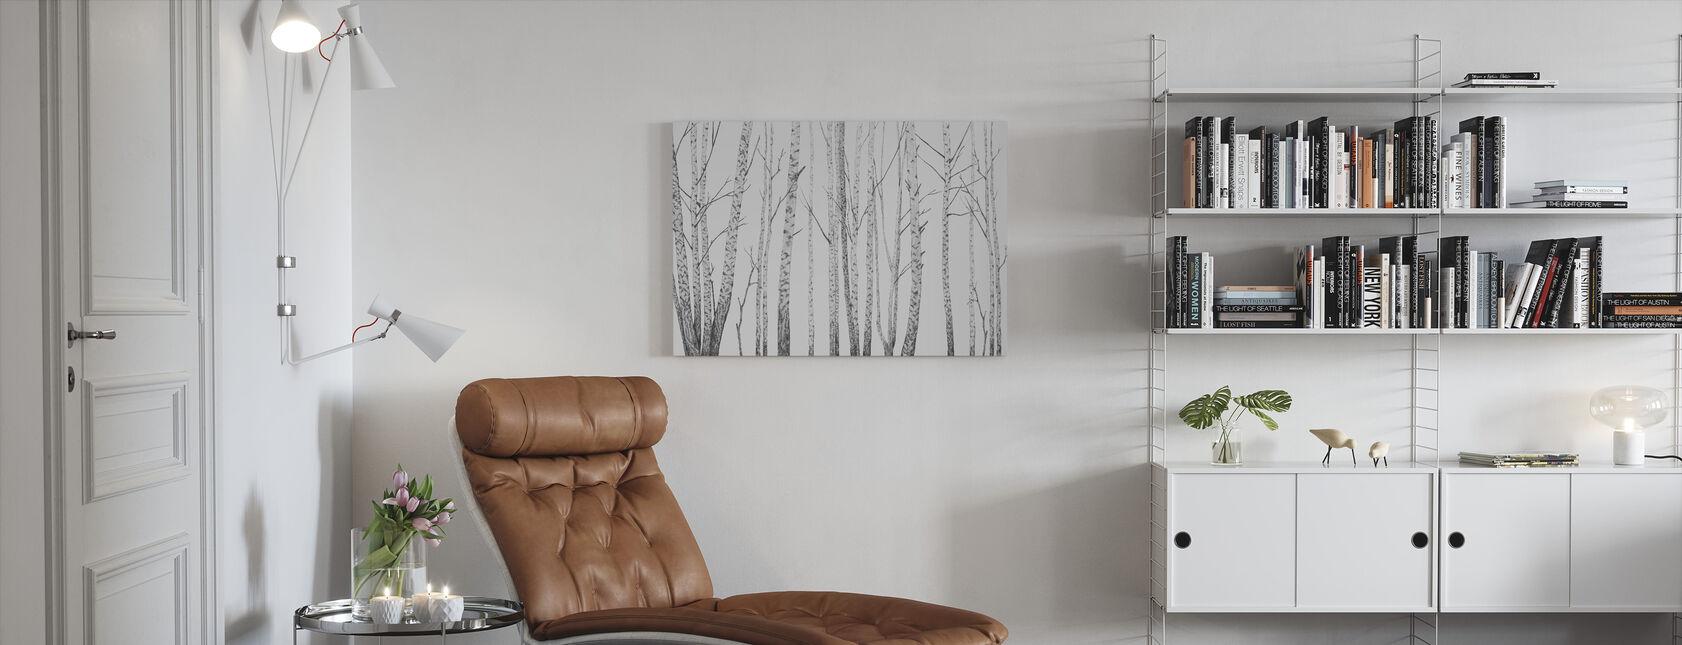 Berk stengels - bw - Canvas print - Woonkamer